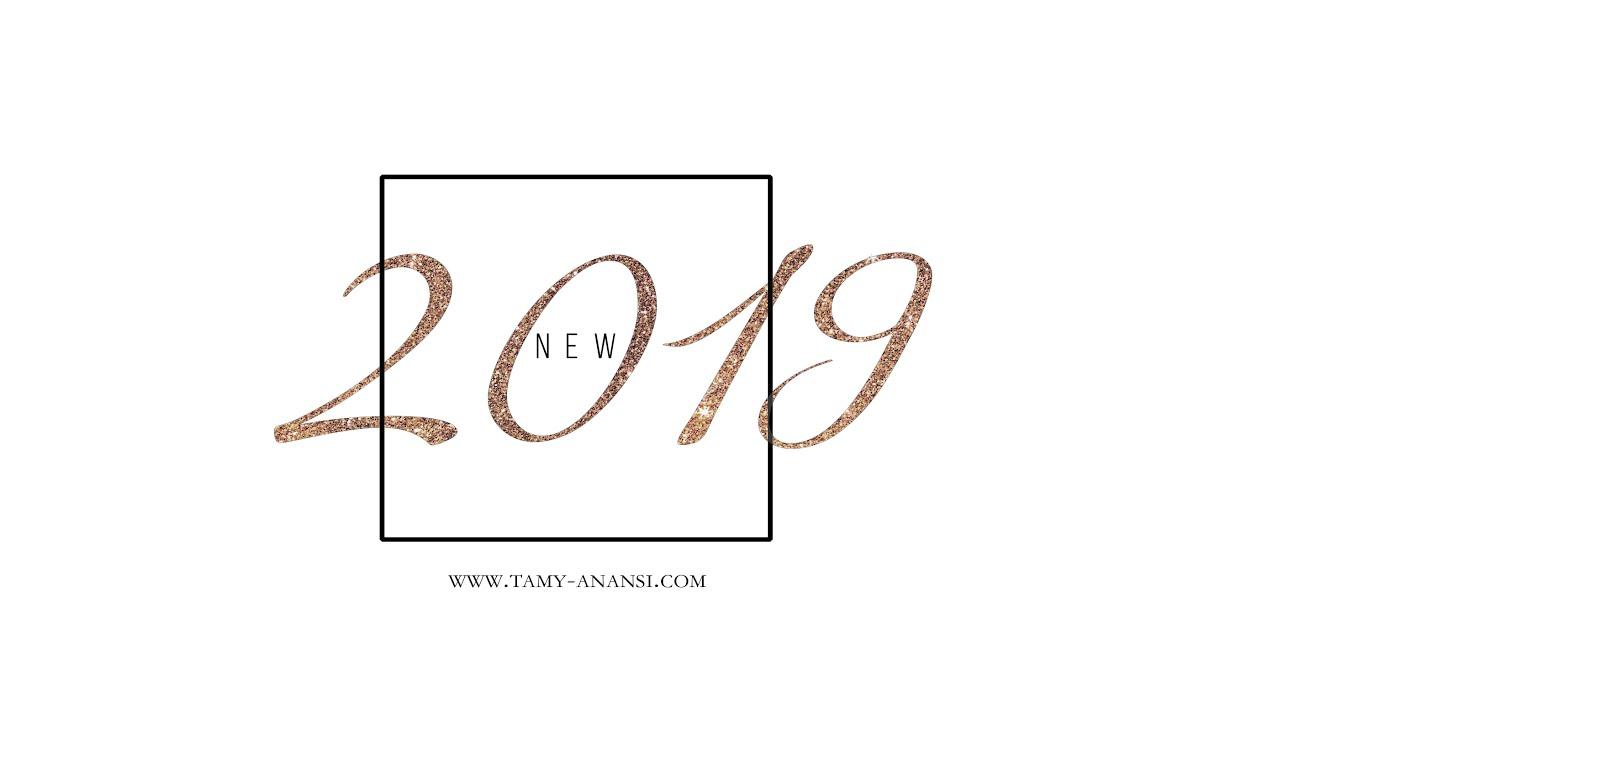 Tamy-Anansi.com